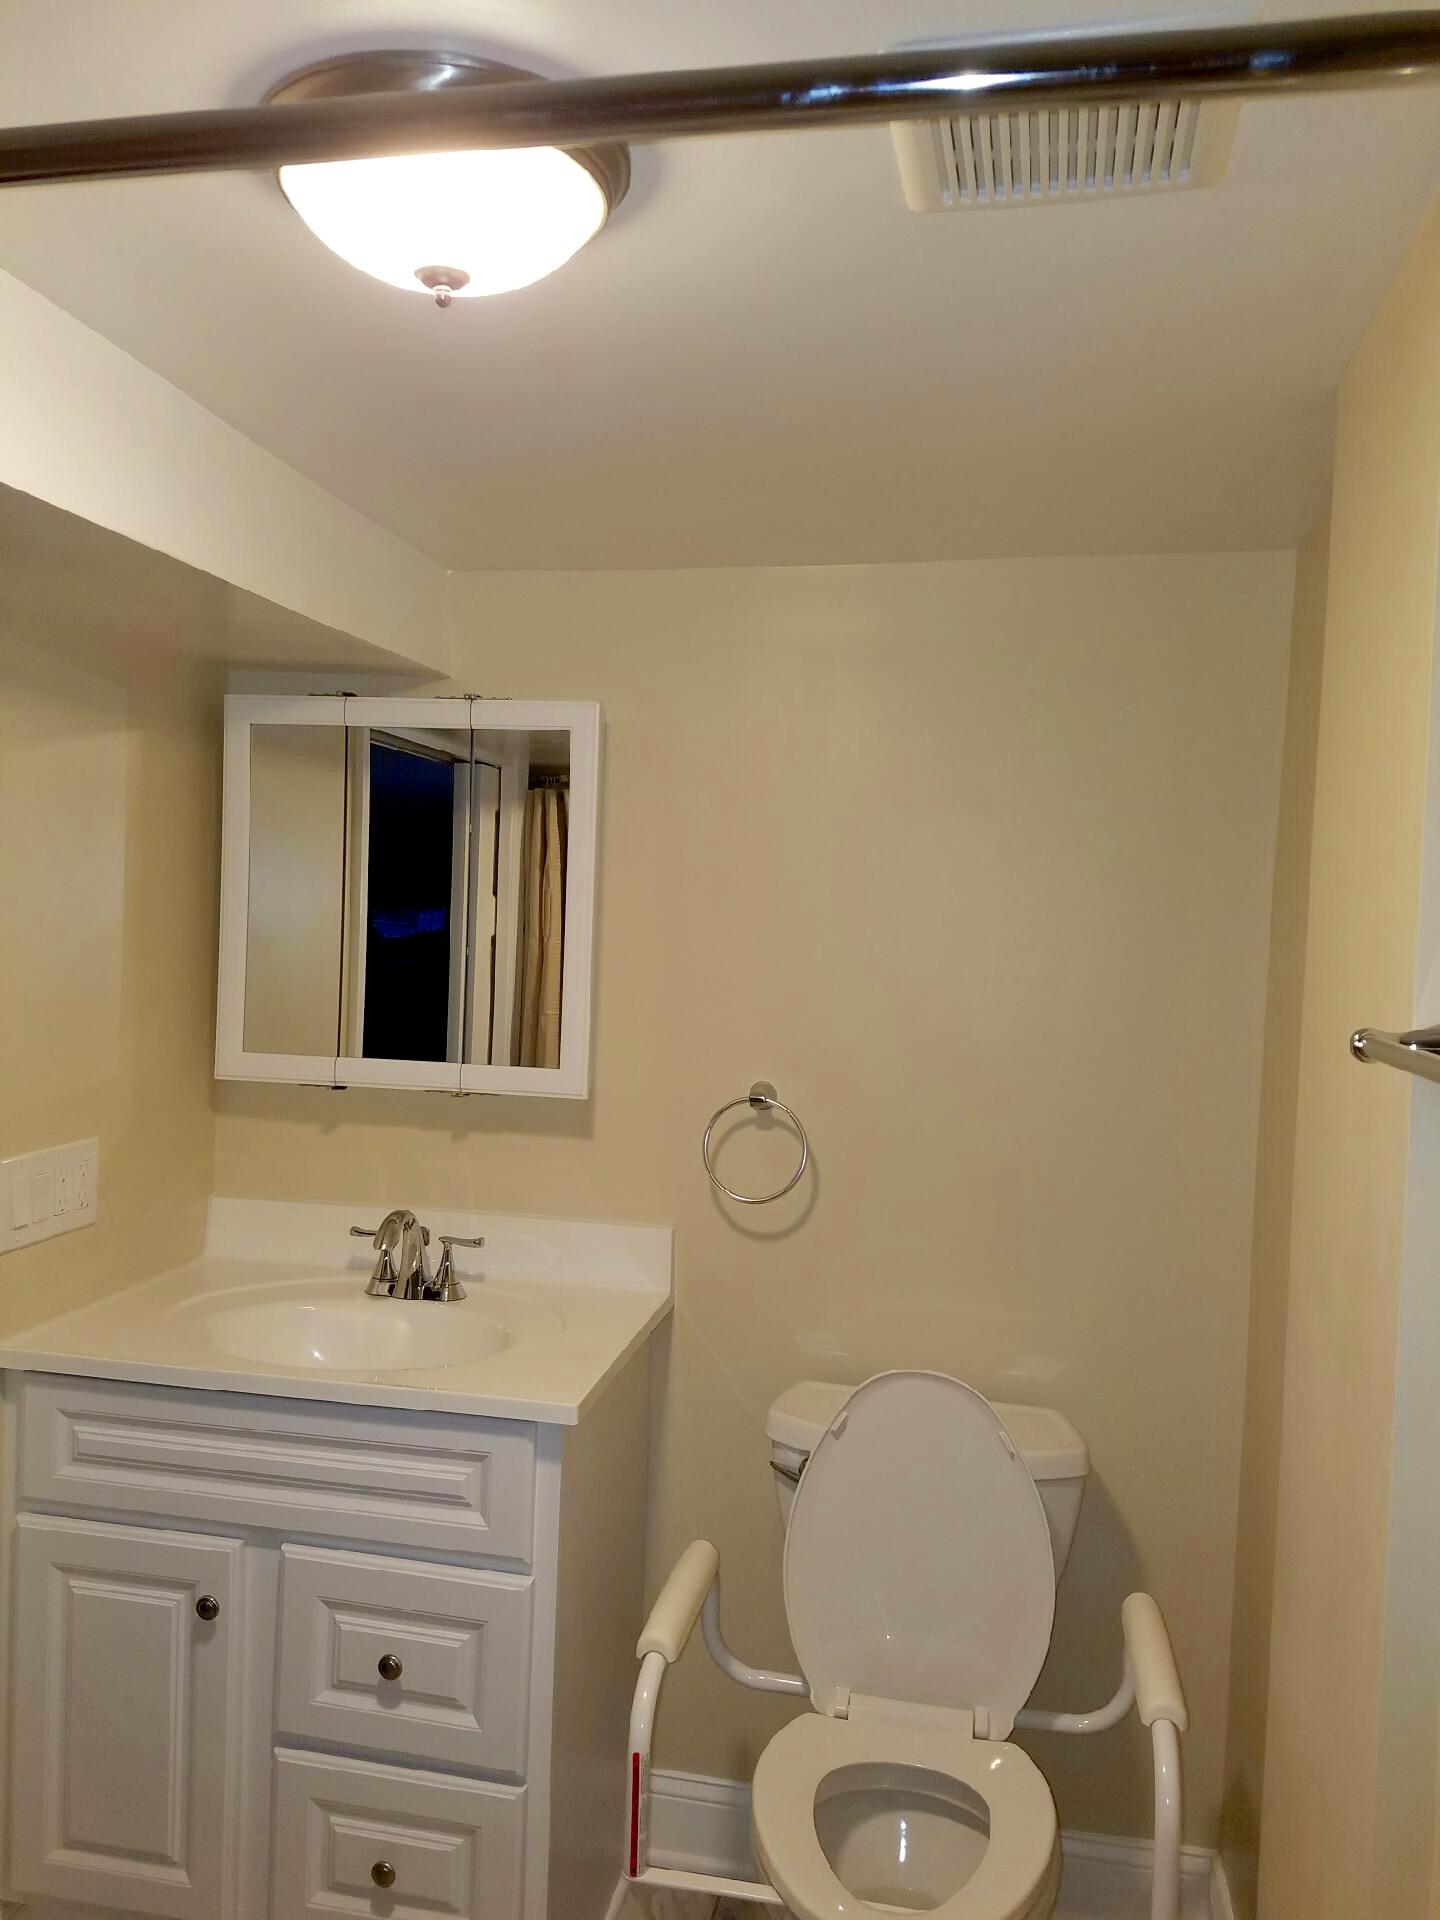 6666 Cornelius St - bathroom 4